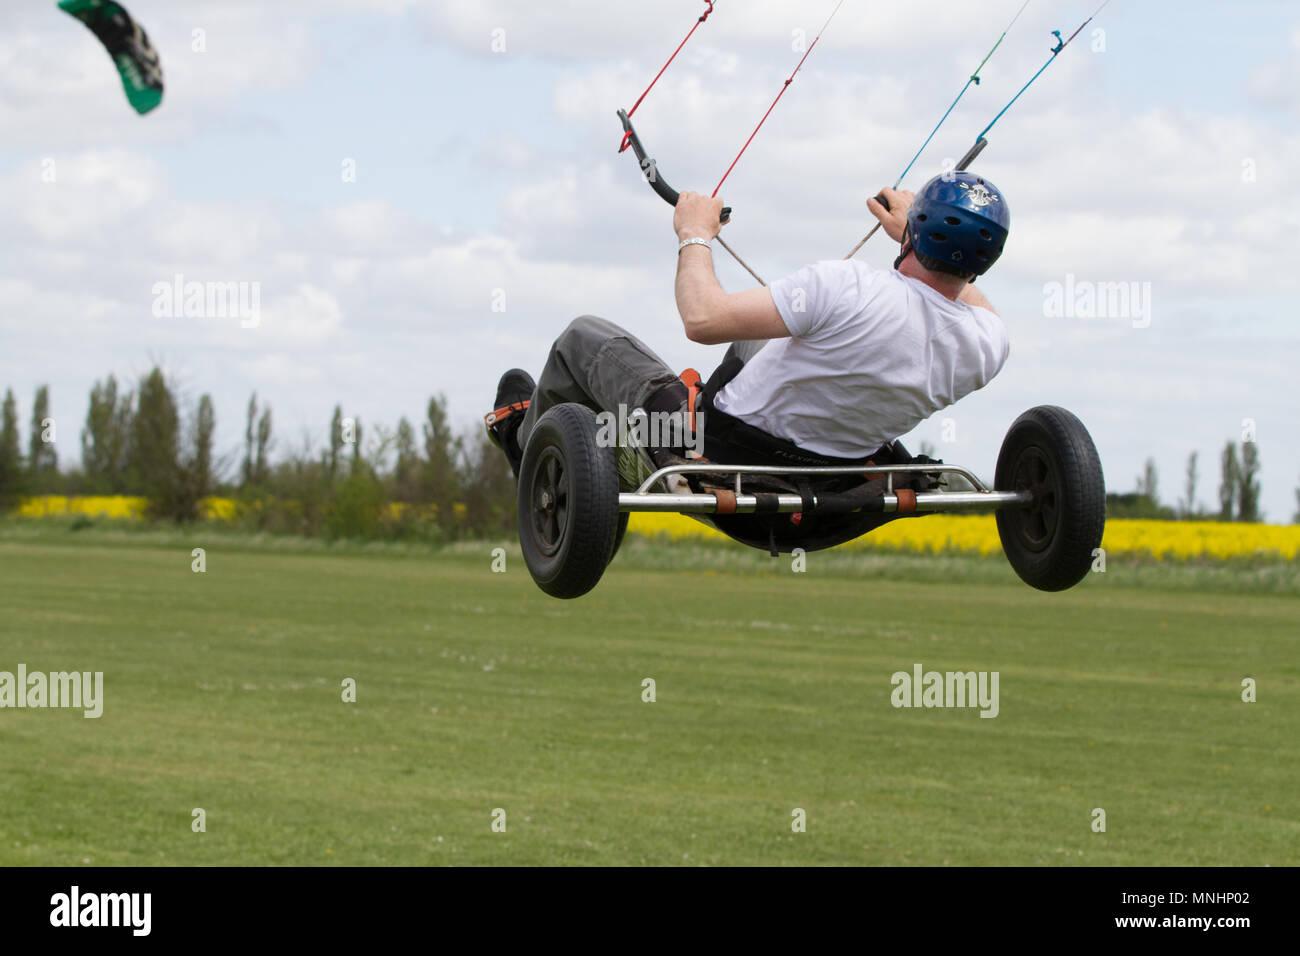 Extreme sport kite landboarding in Essex, UK. Airborne in a land buggy.. - Stock Image